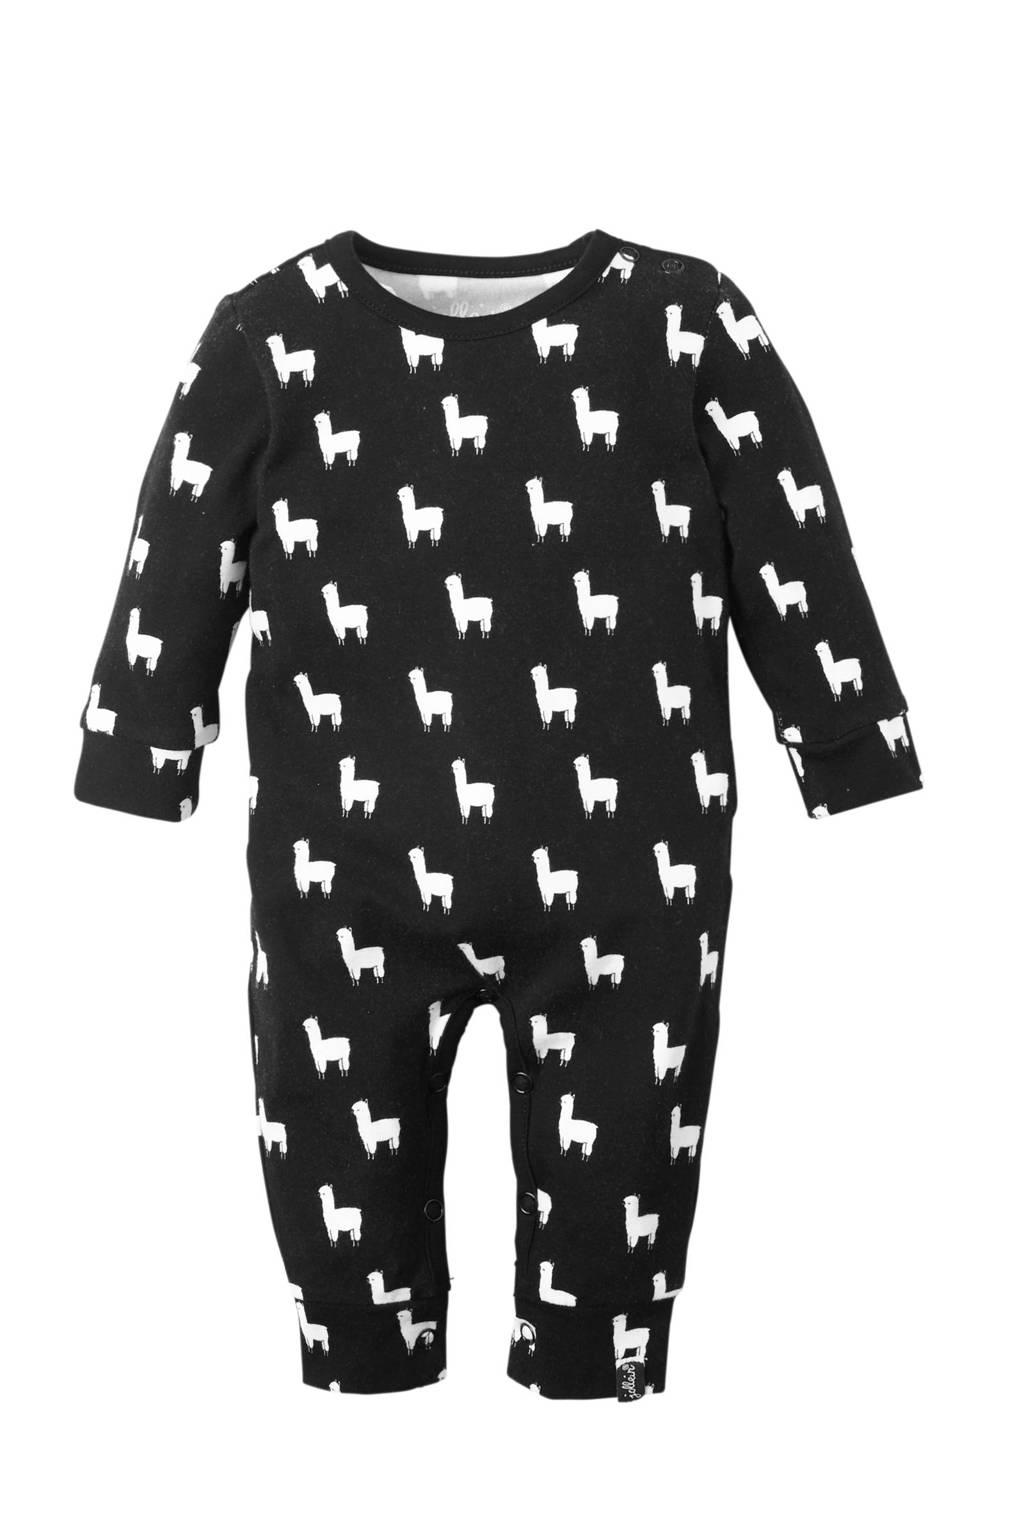 Jollein baby boxpak met lama print zwart, Zwart/wit